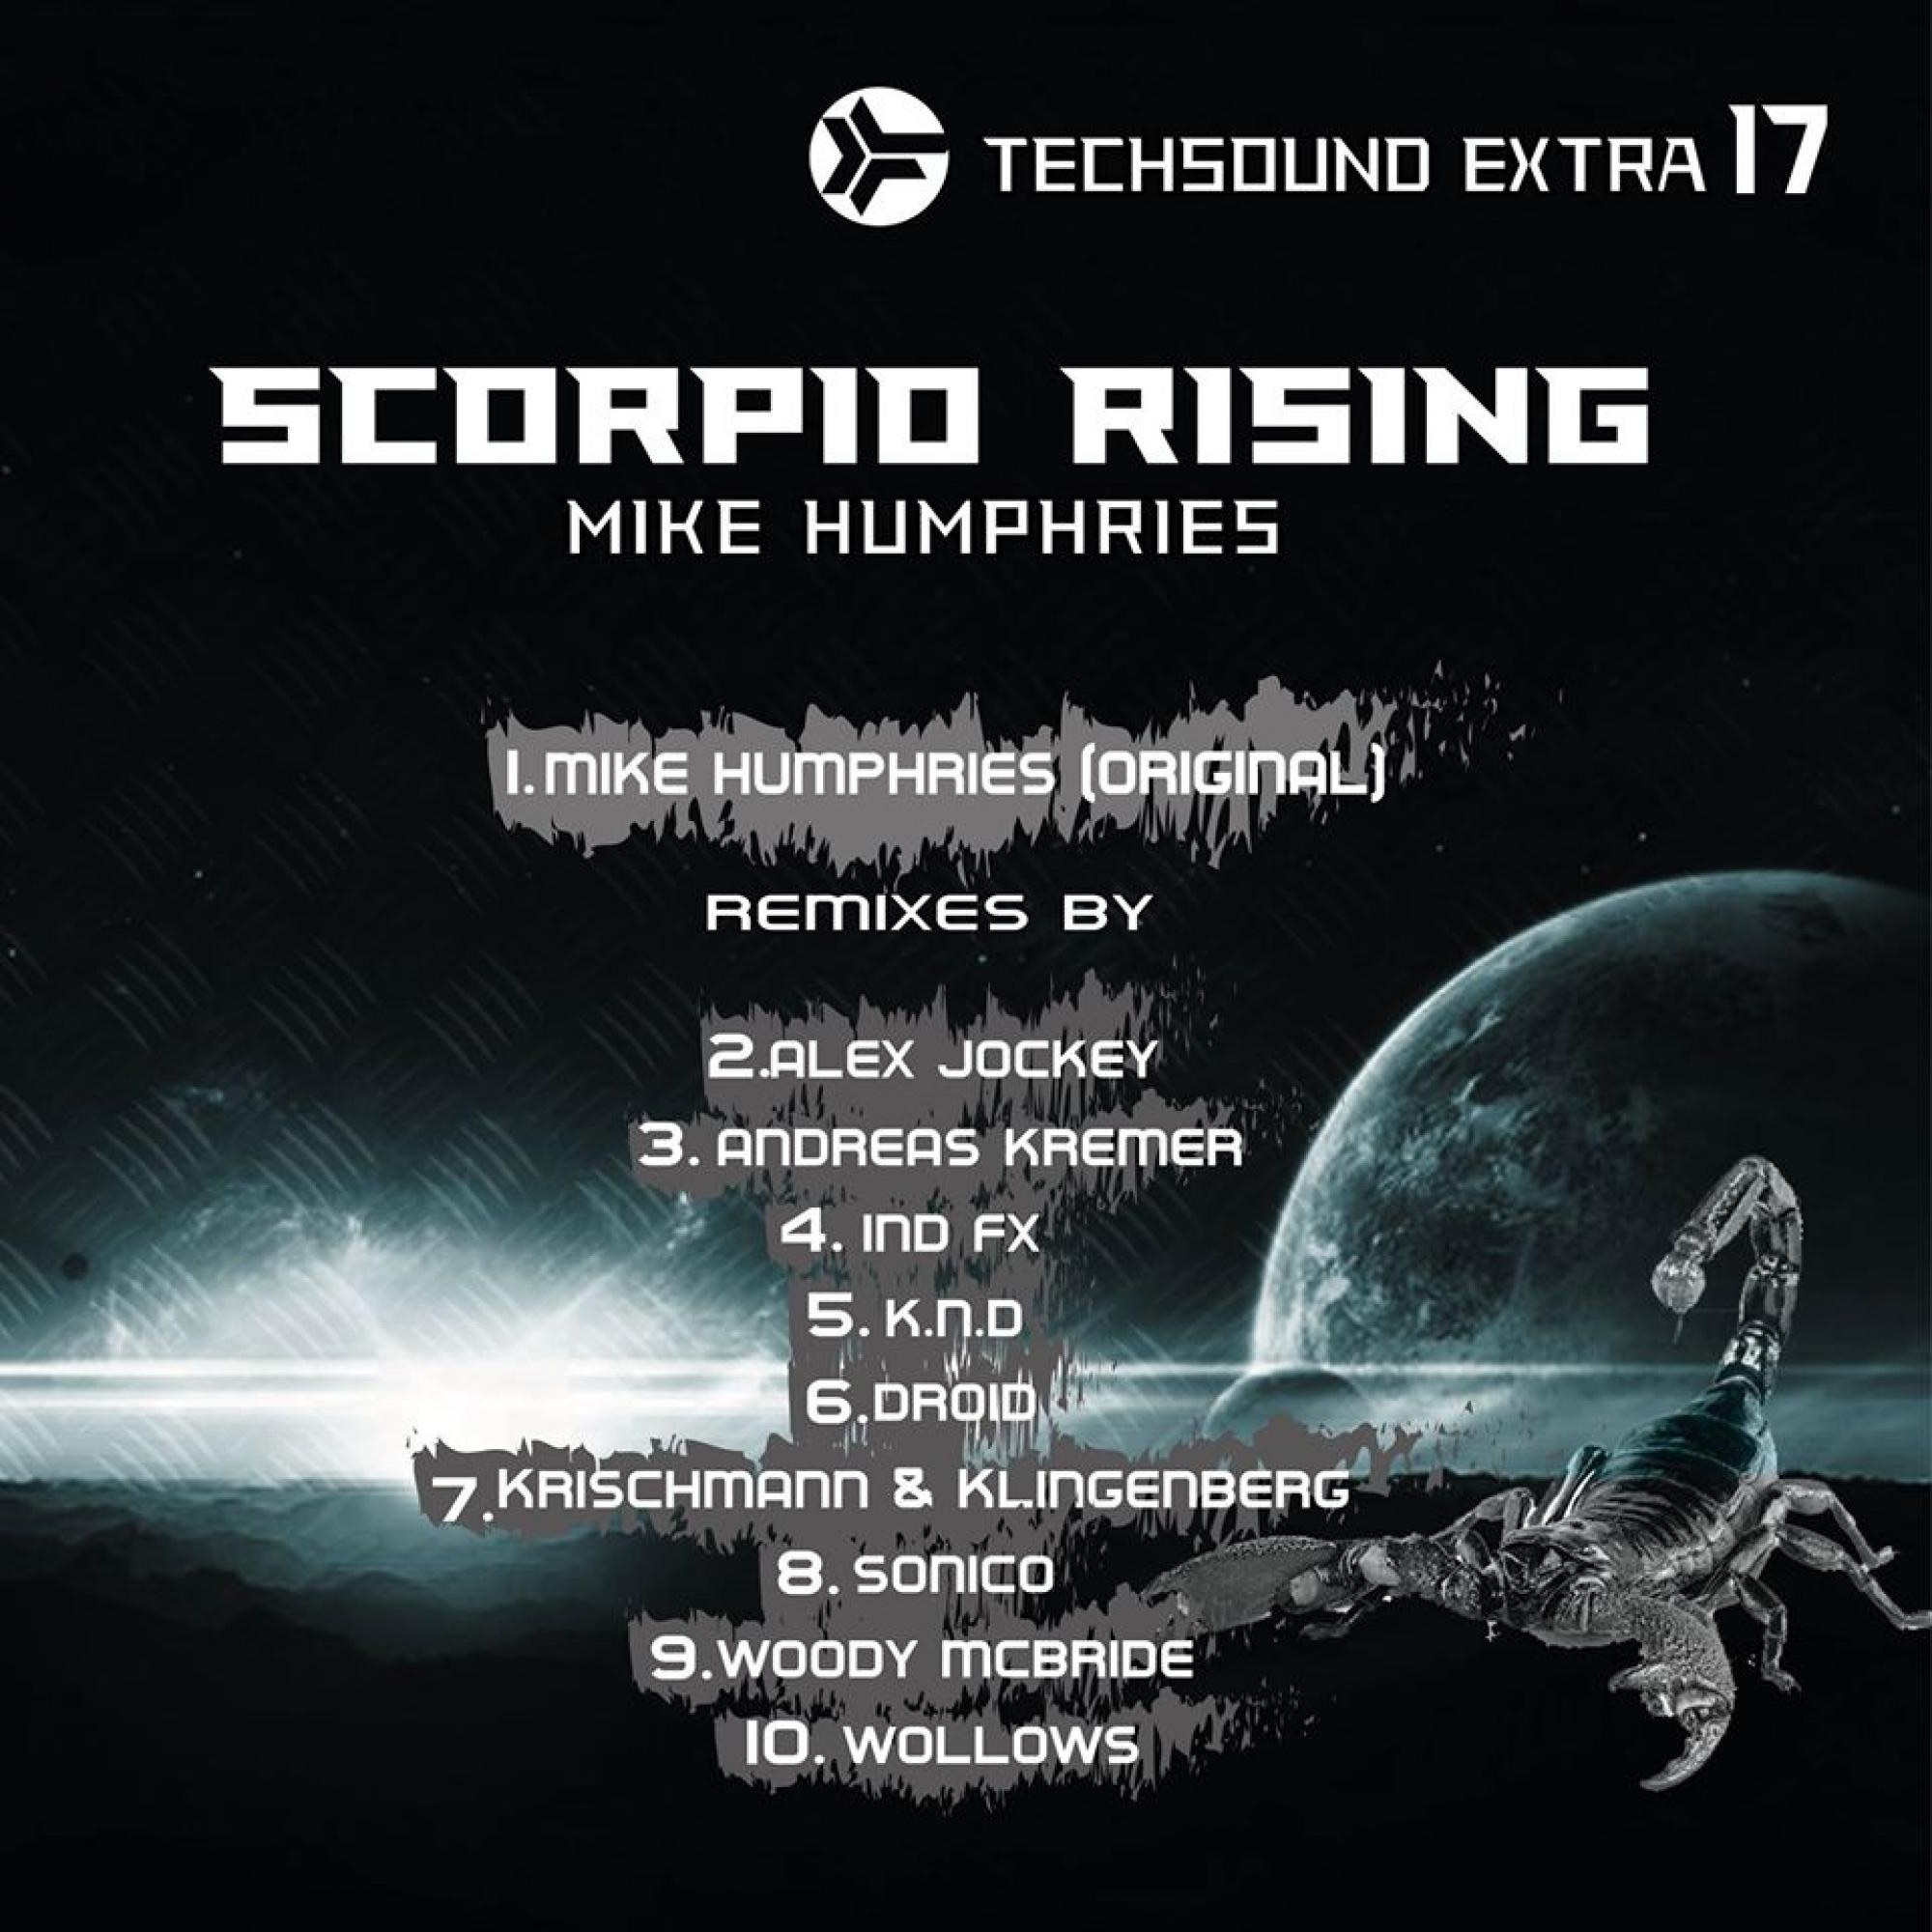 Techsound Extra 17: Scorpio Rising